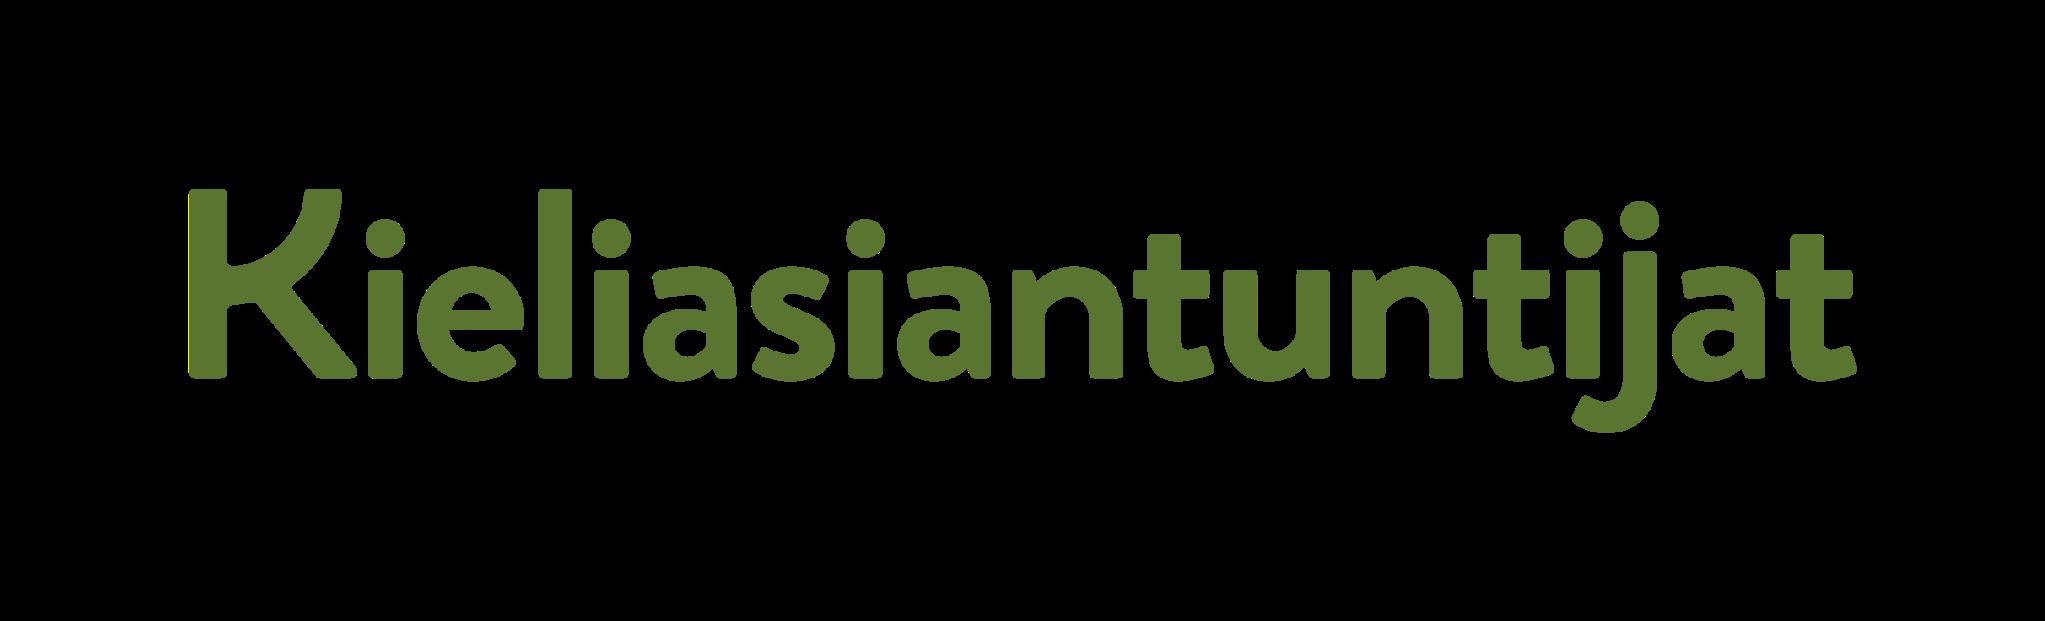 kieliasiantuntijat_logo_vihrea_rgb_läpinäkyvä